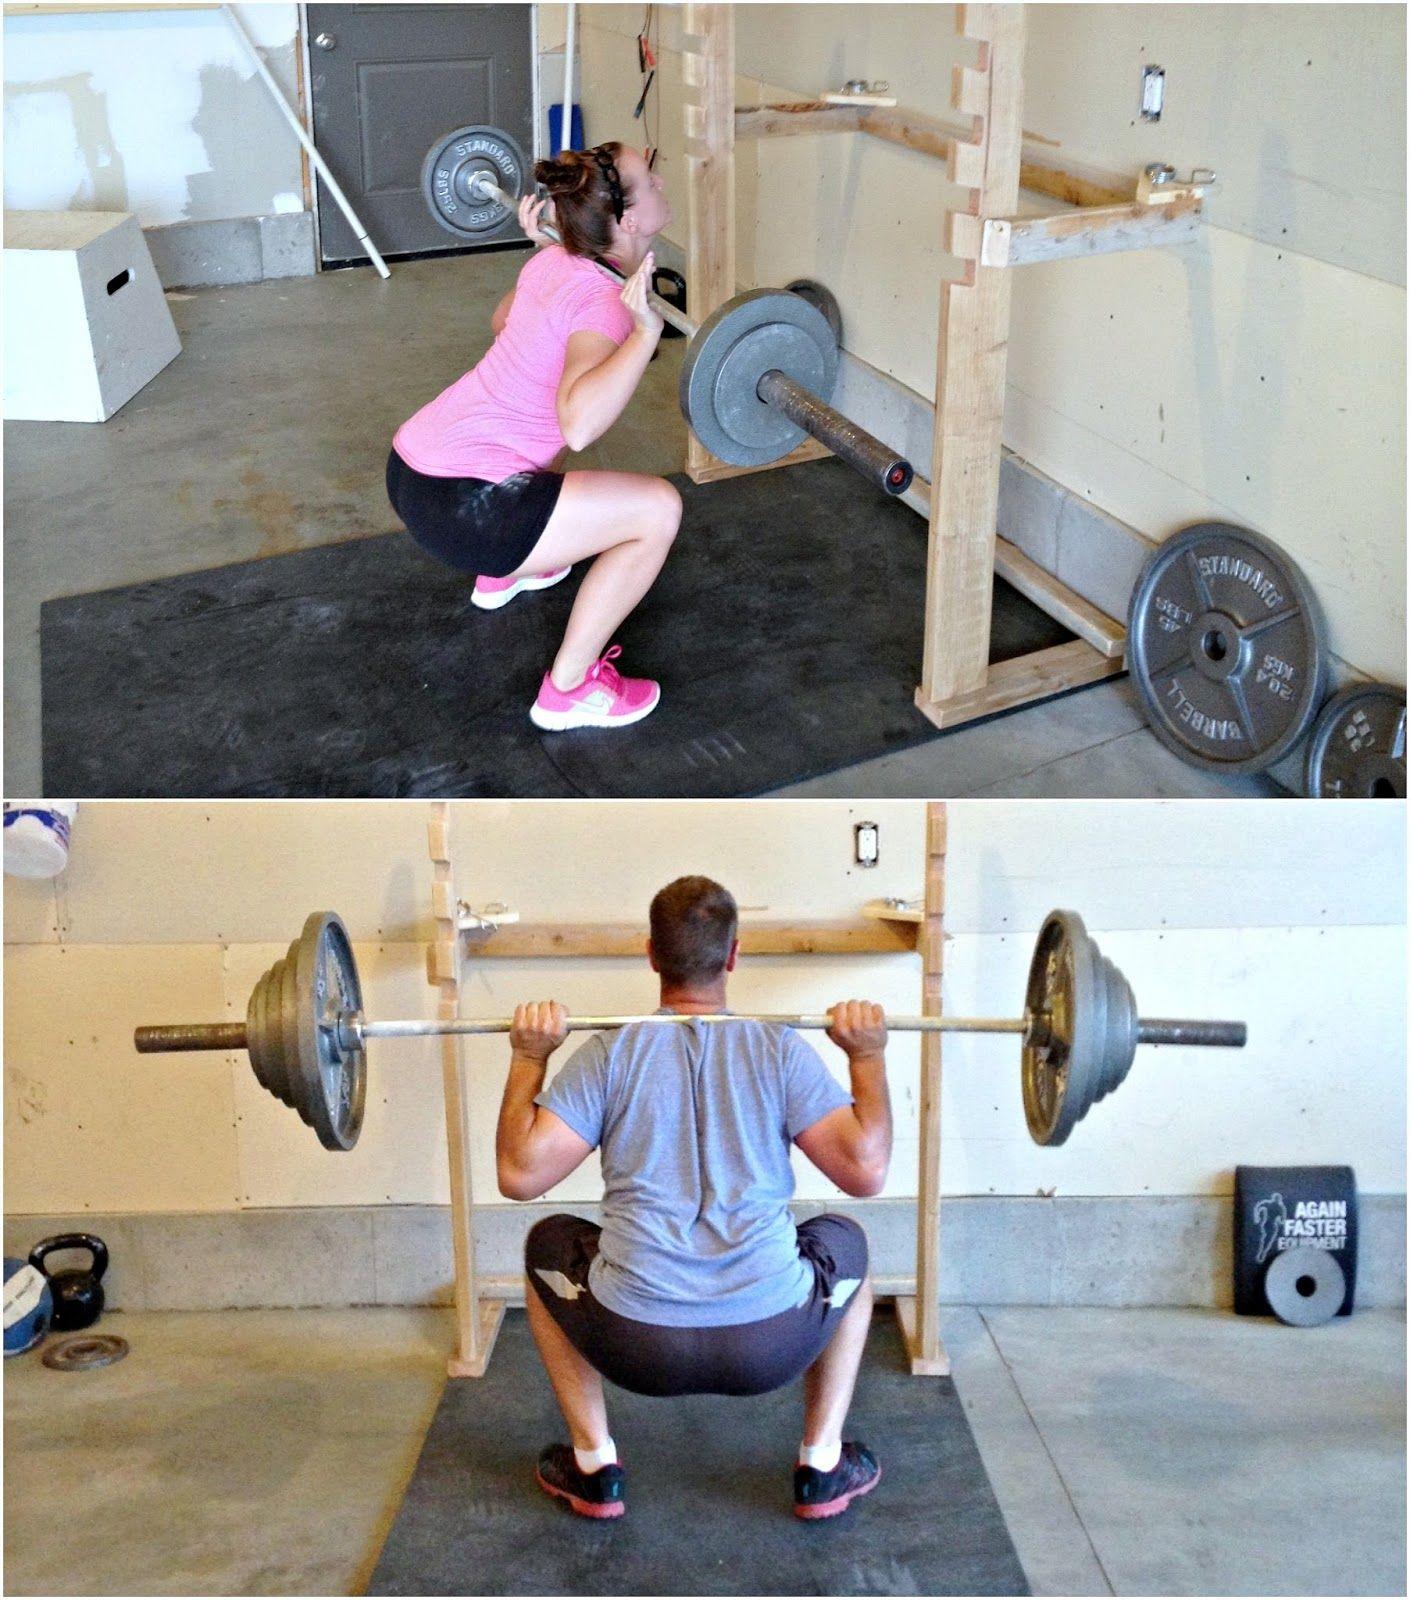 Fitness Equipment World Edmond Ok: DIY Squatrack And Pull Up Bar